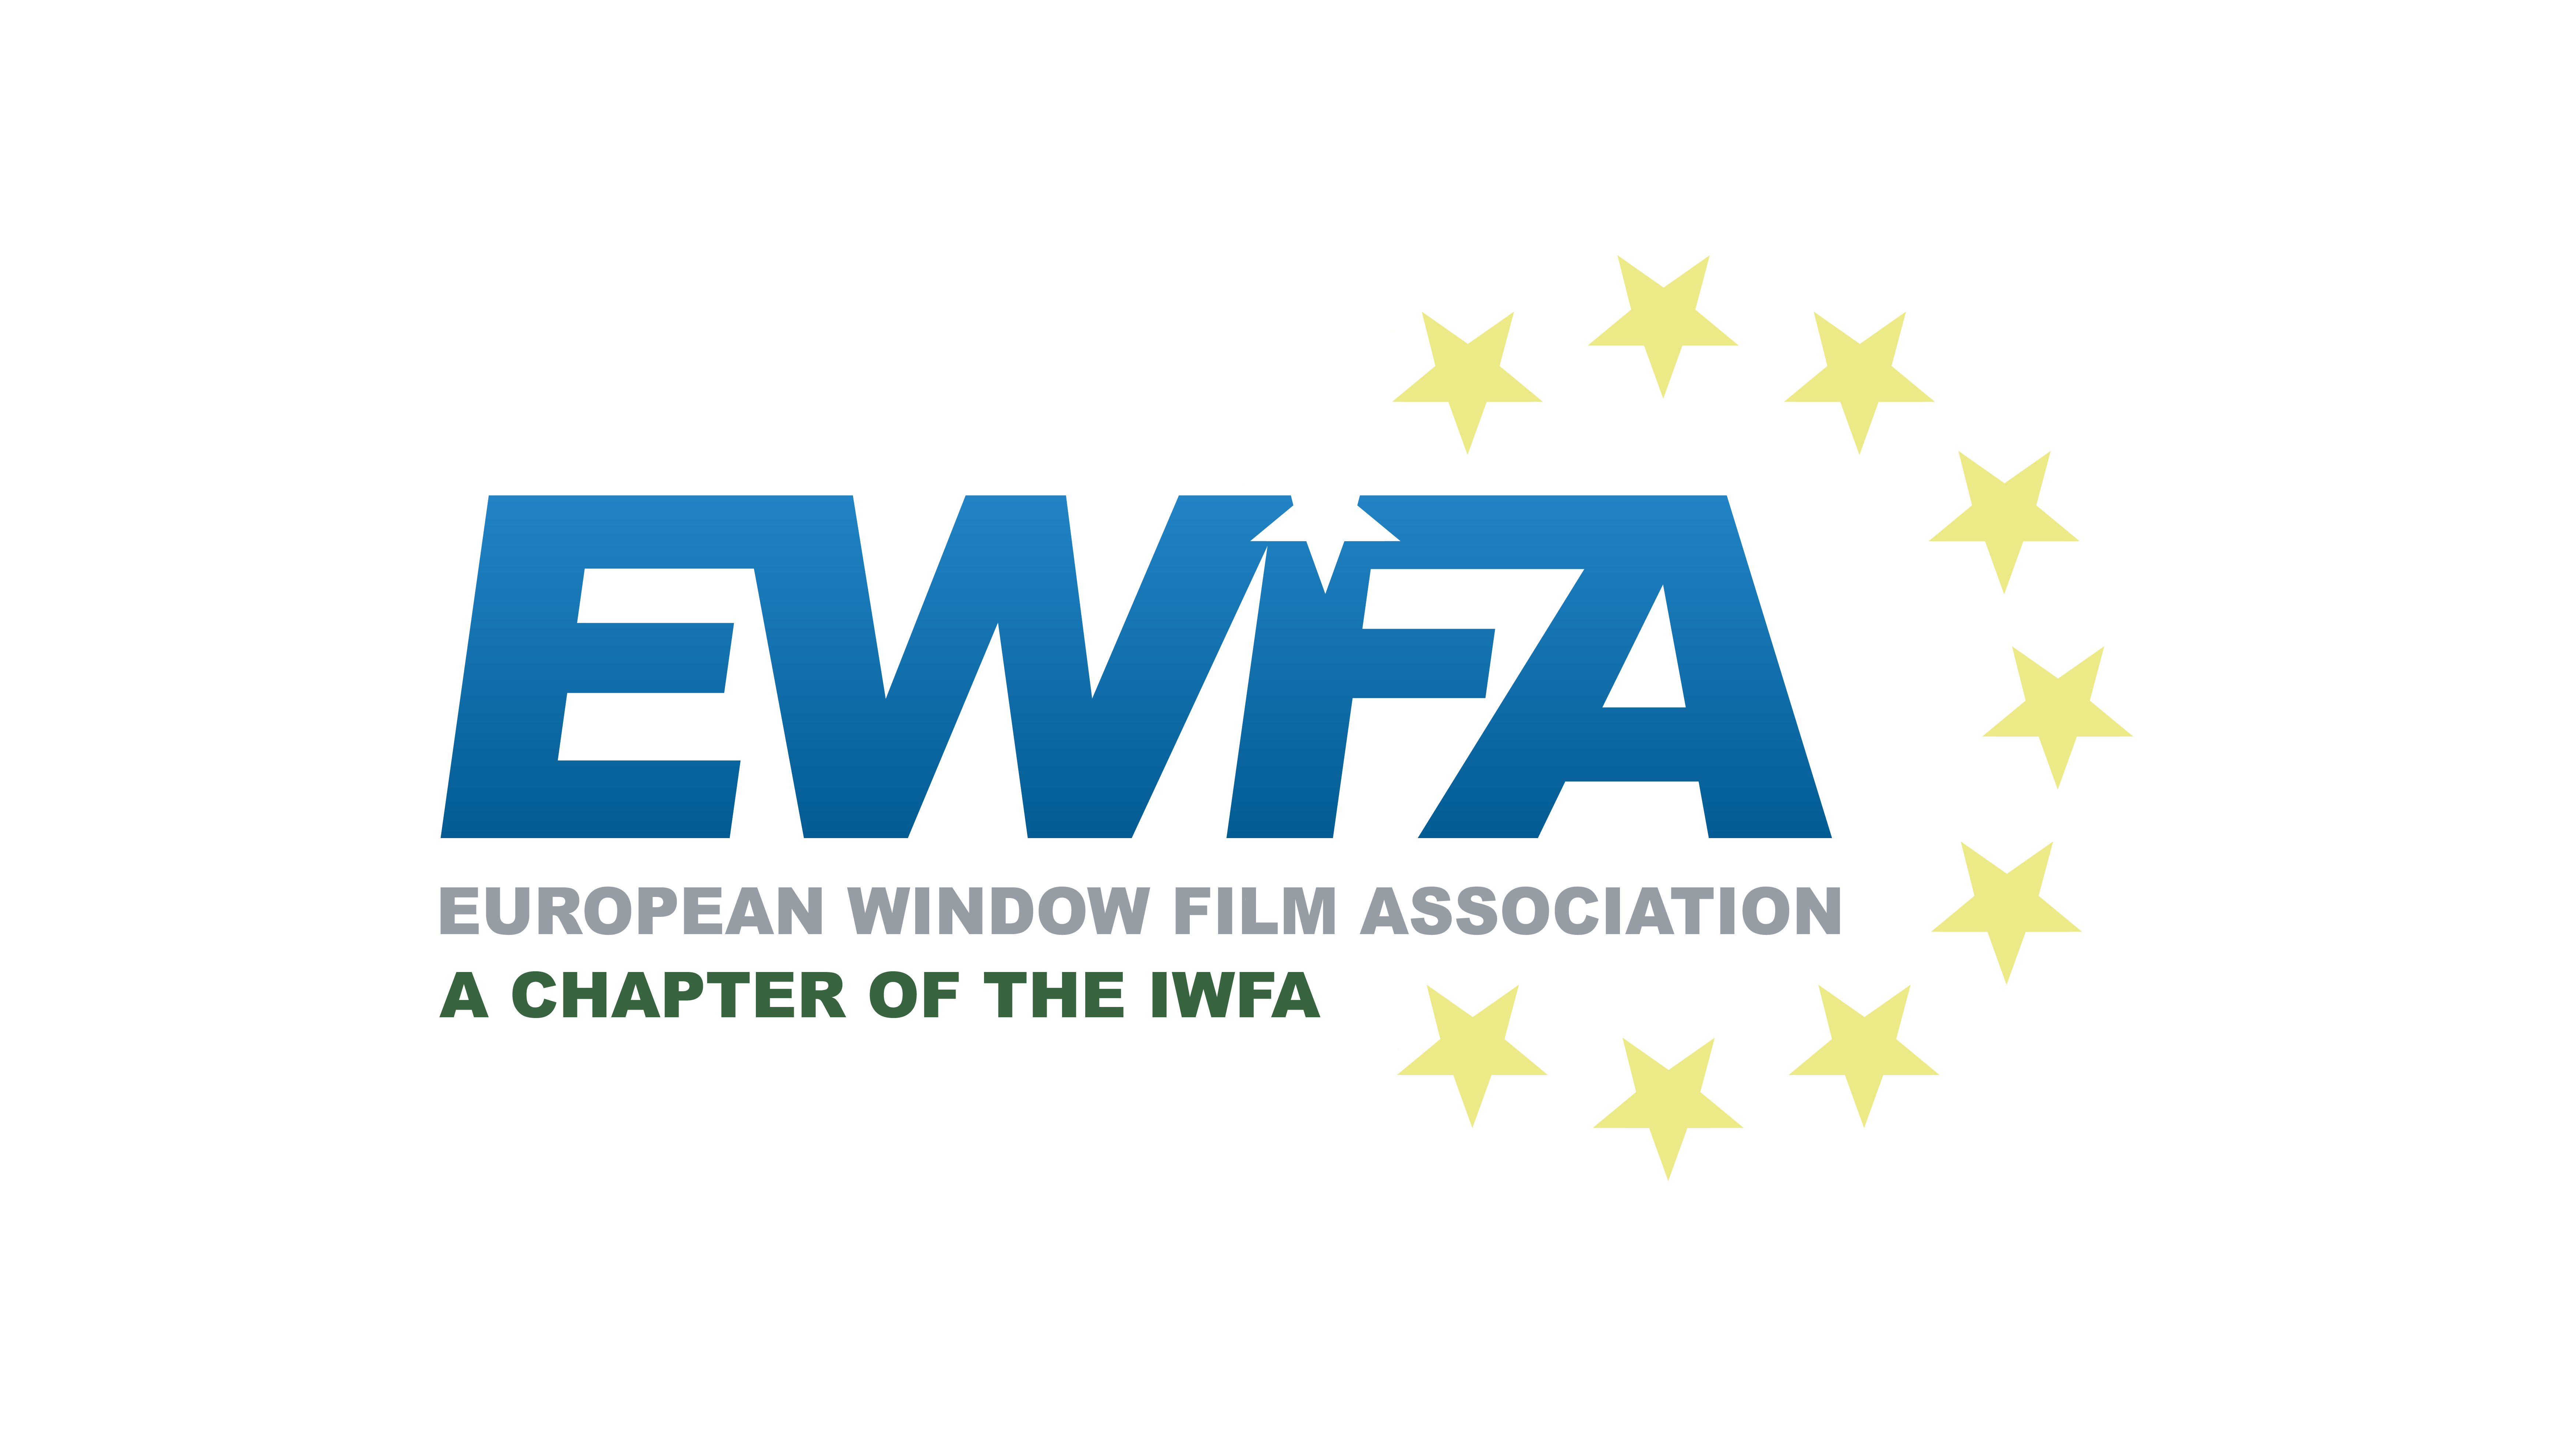 European Window Film Association